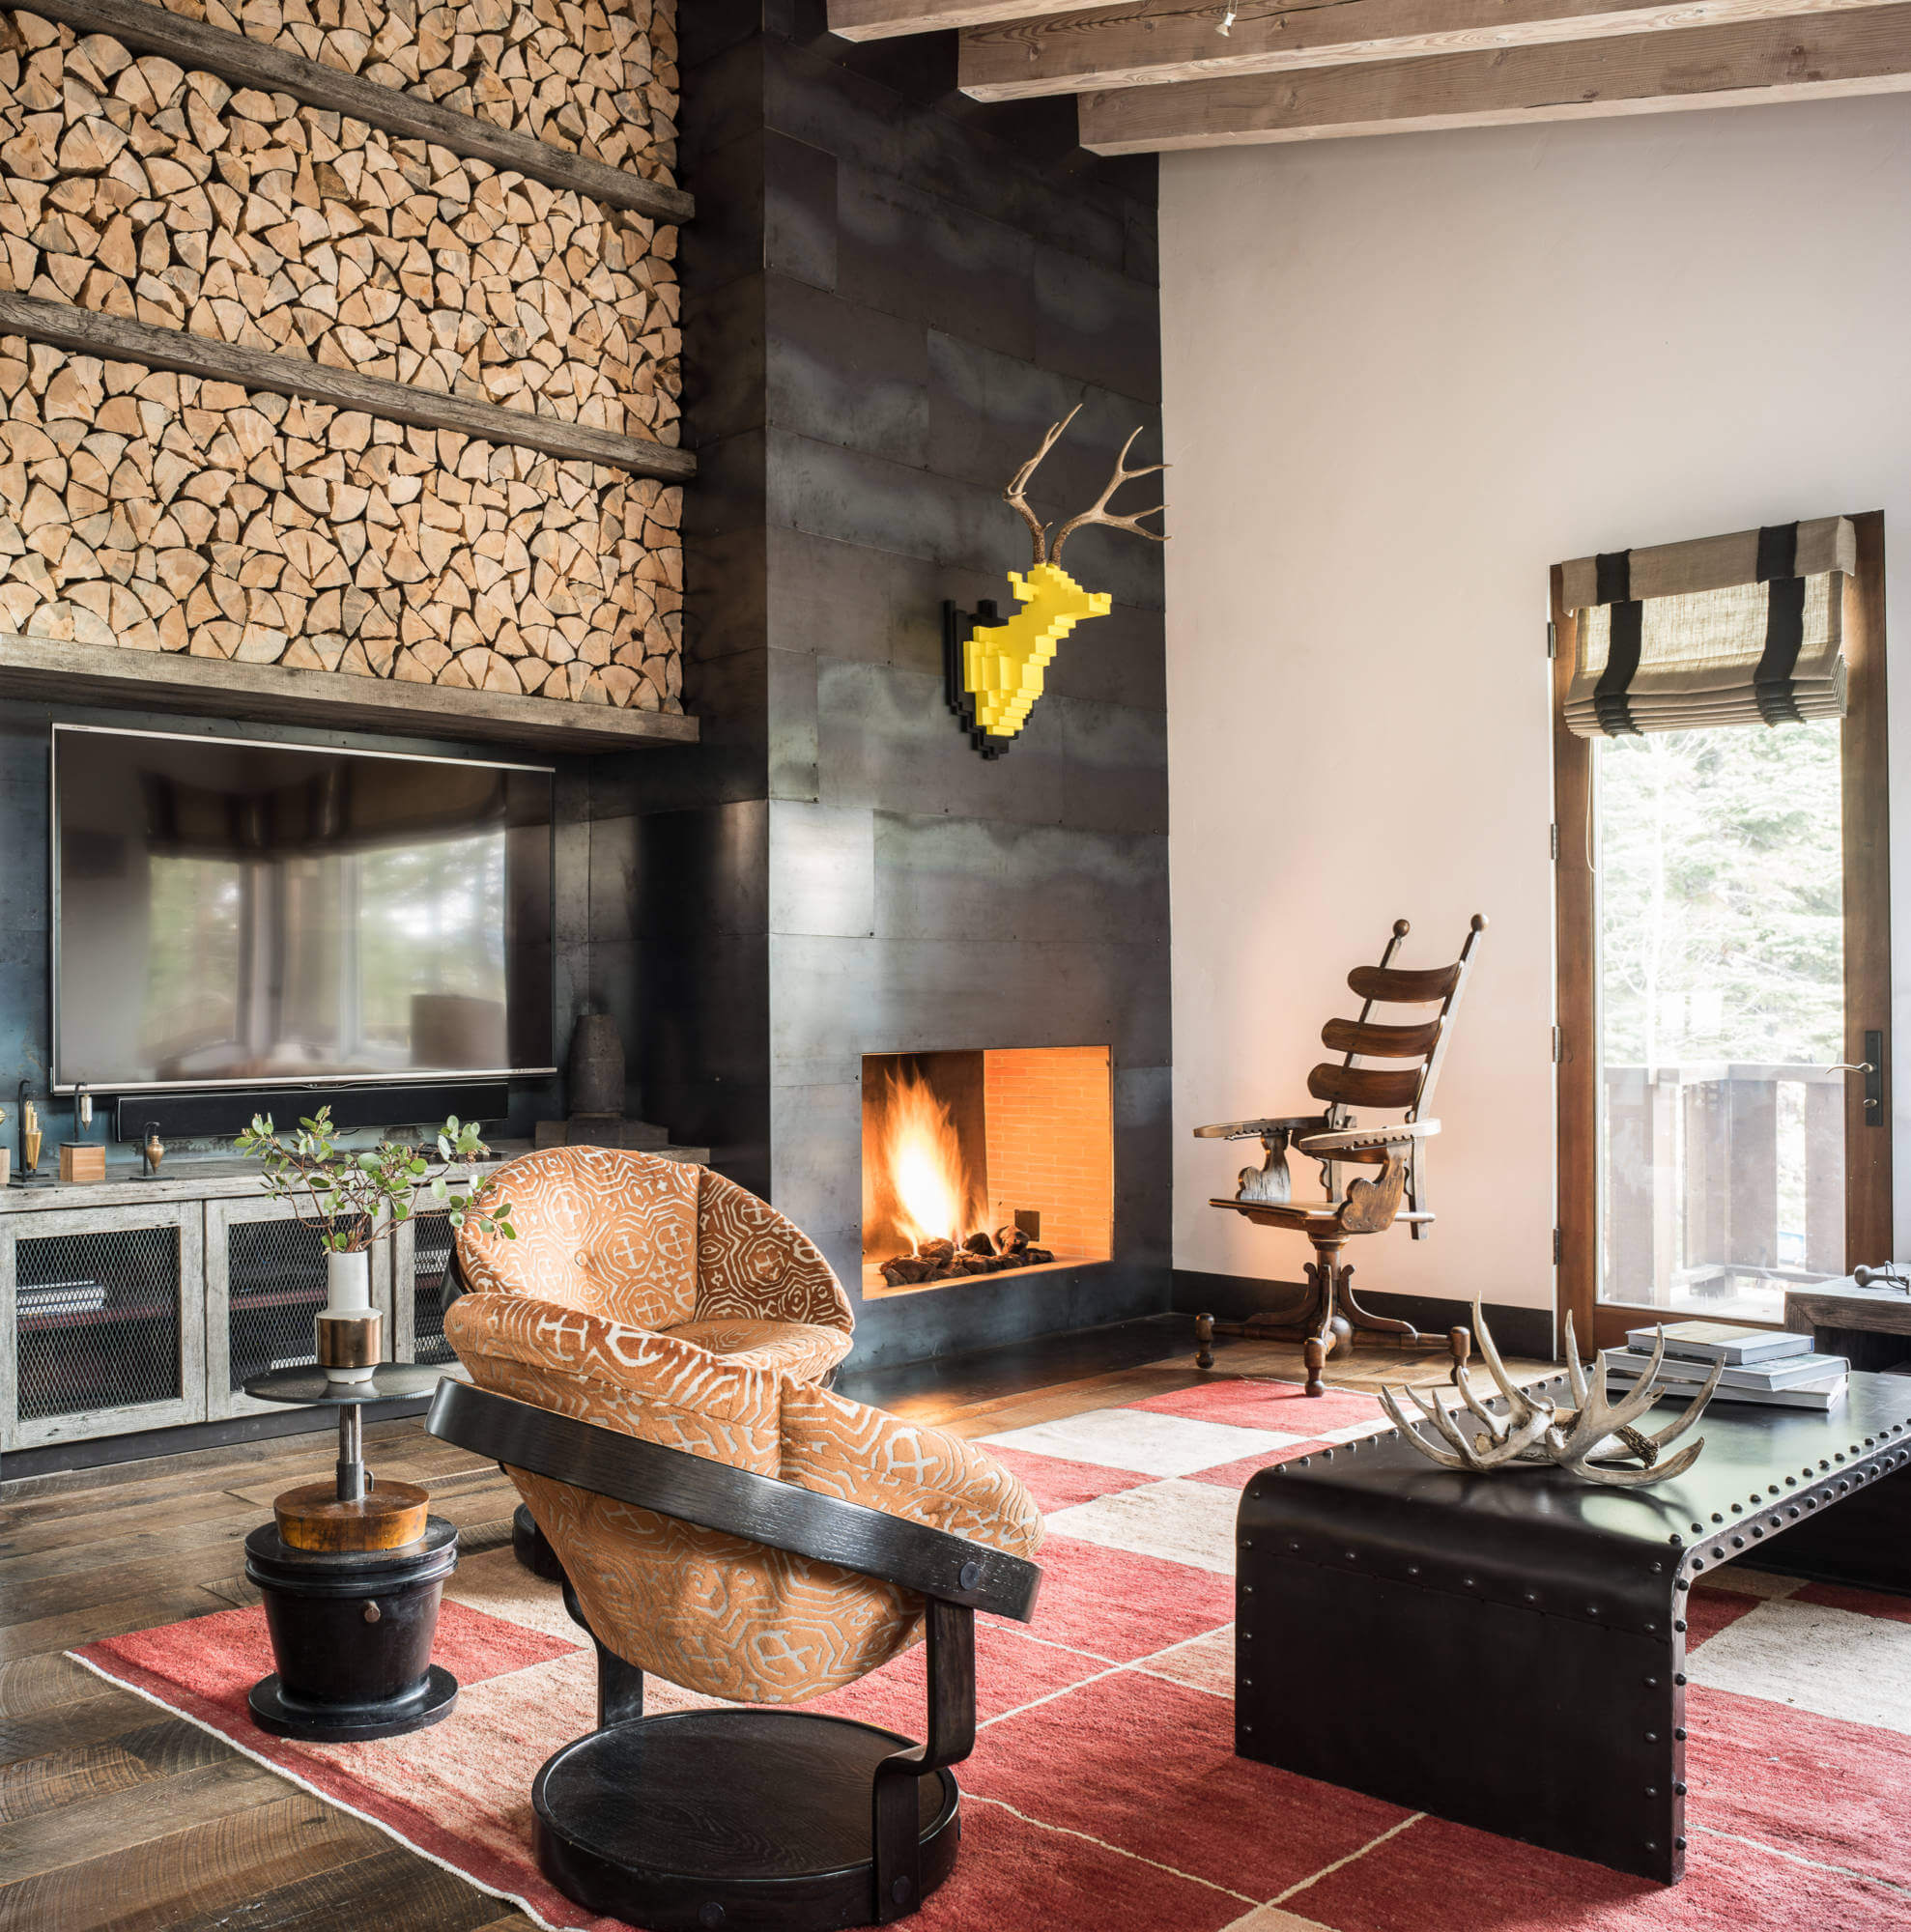 truckee-retreat-antonio-martins-interior-design-02